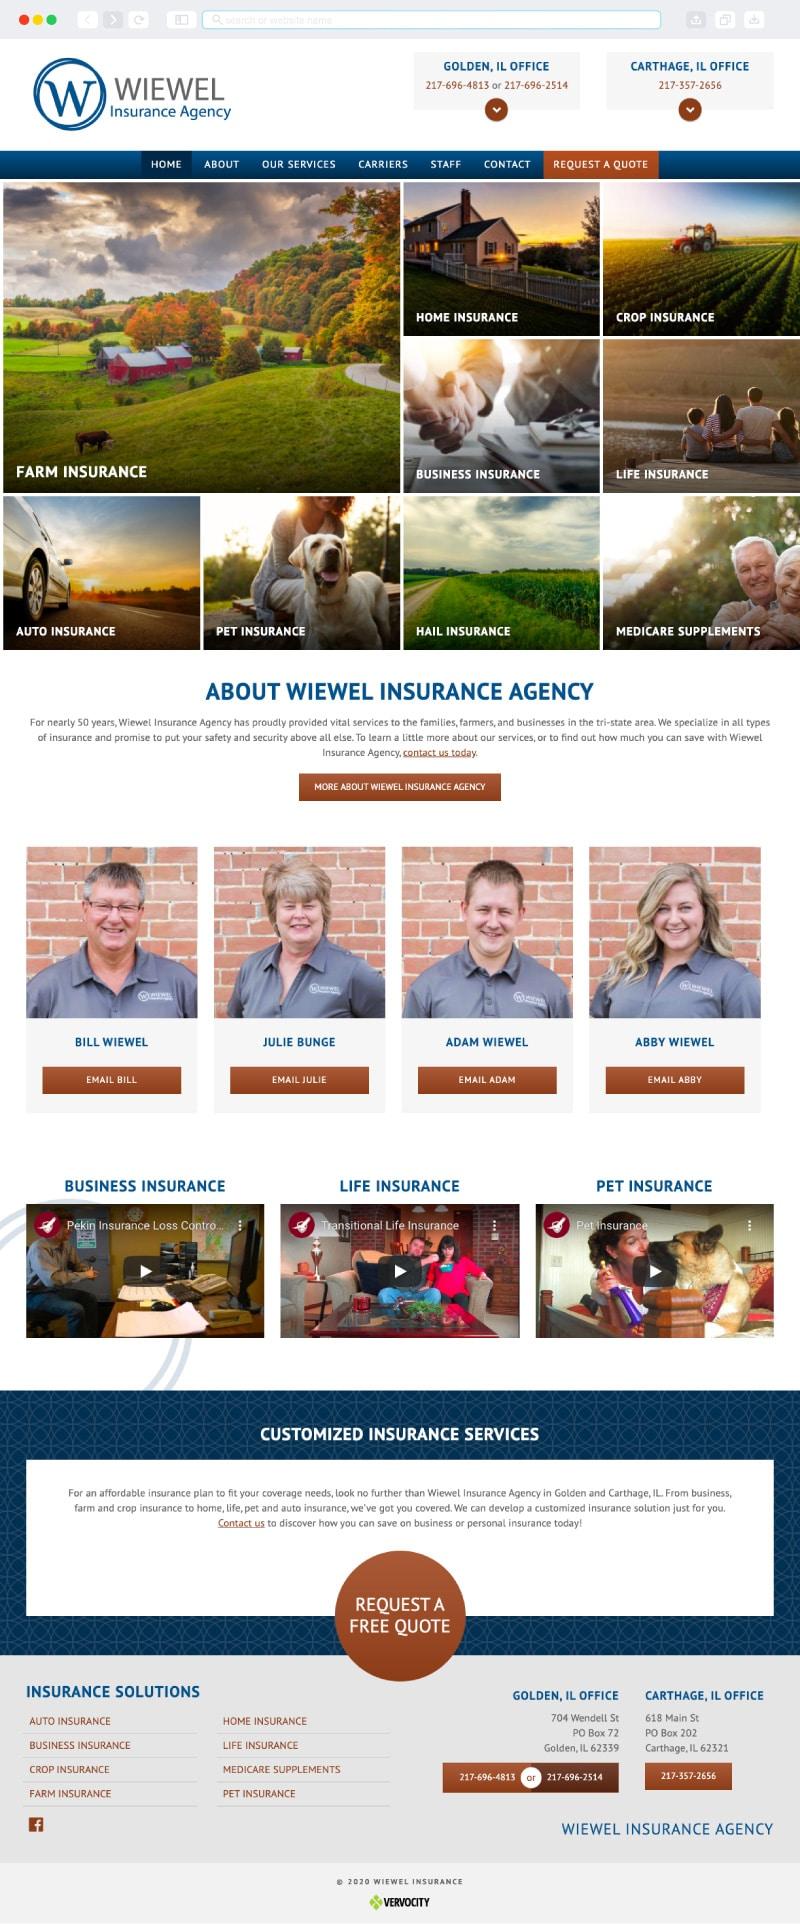 Wiewel Insurance Homepage | Vervocity